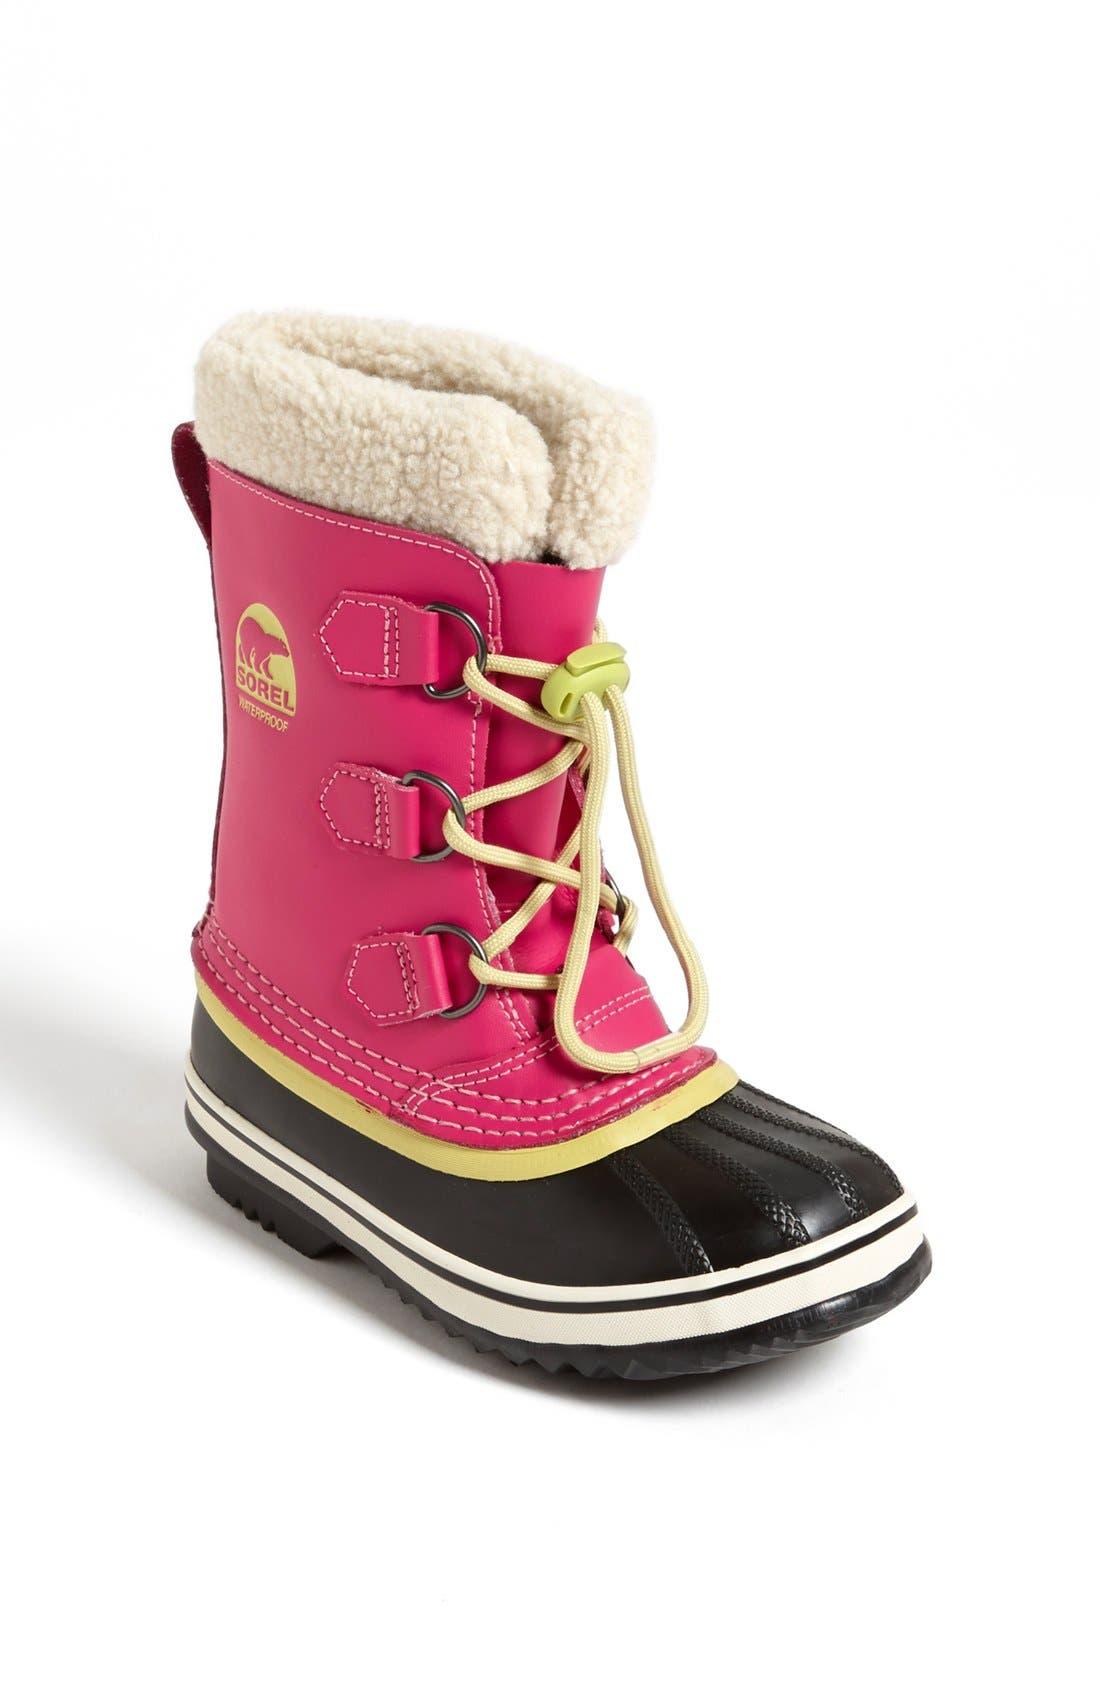 Alternate Image 1 Selected - SOREL 'Yoot Pac' Weatherproof Boot (Toddler, Little Kid & Big Kid)